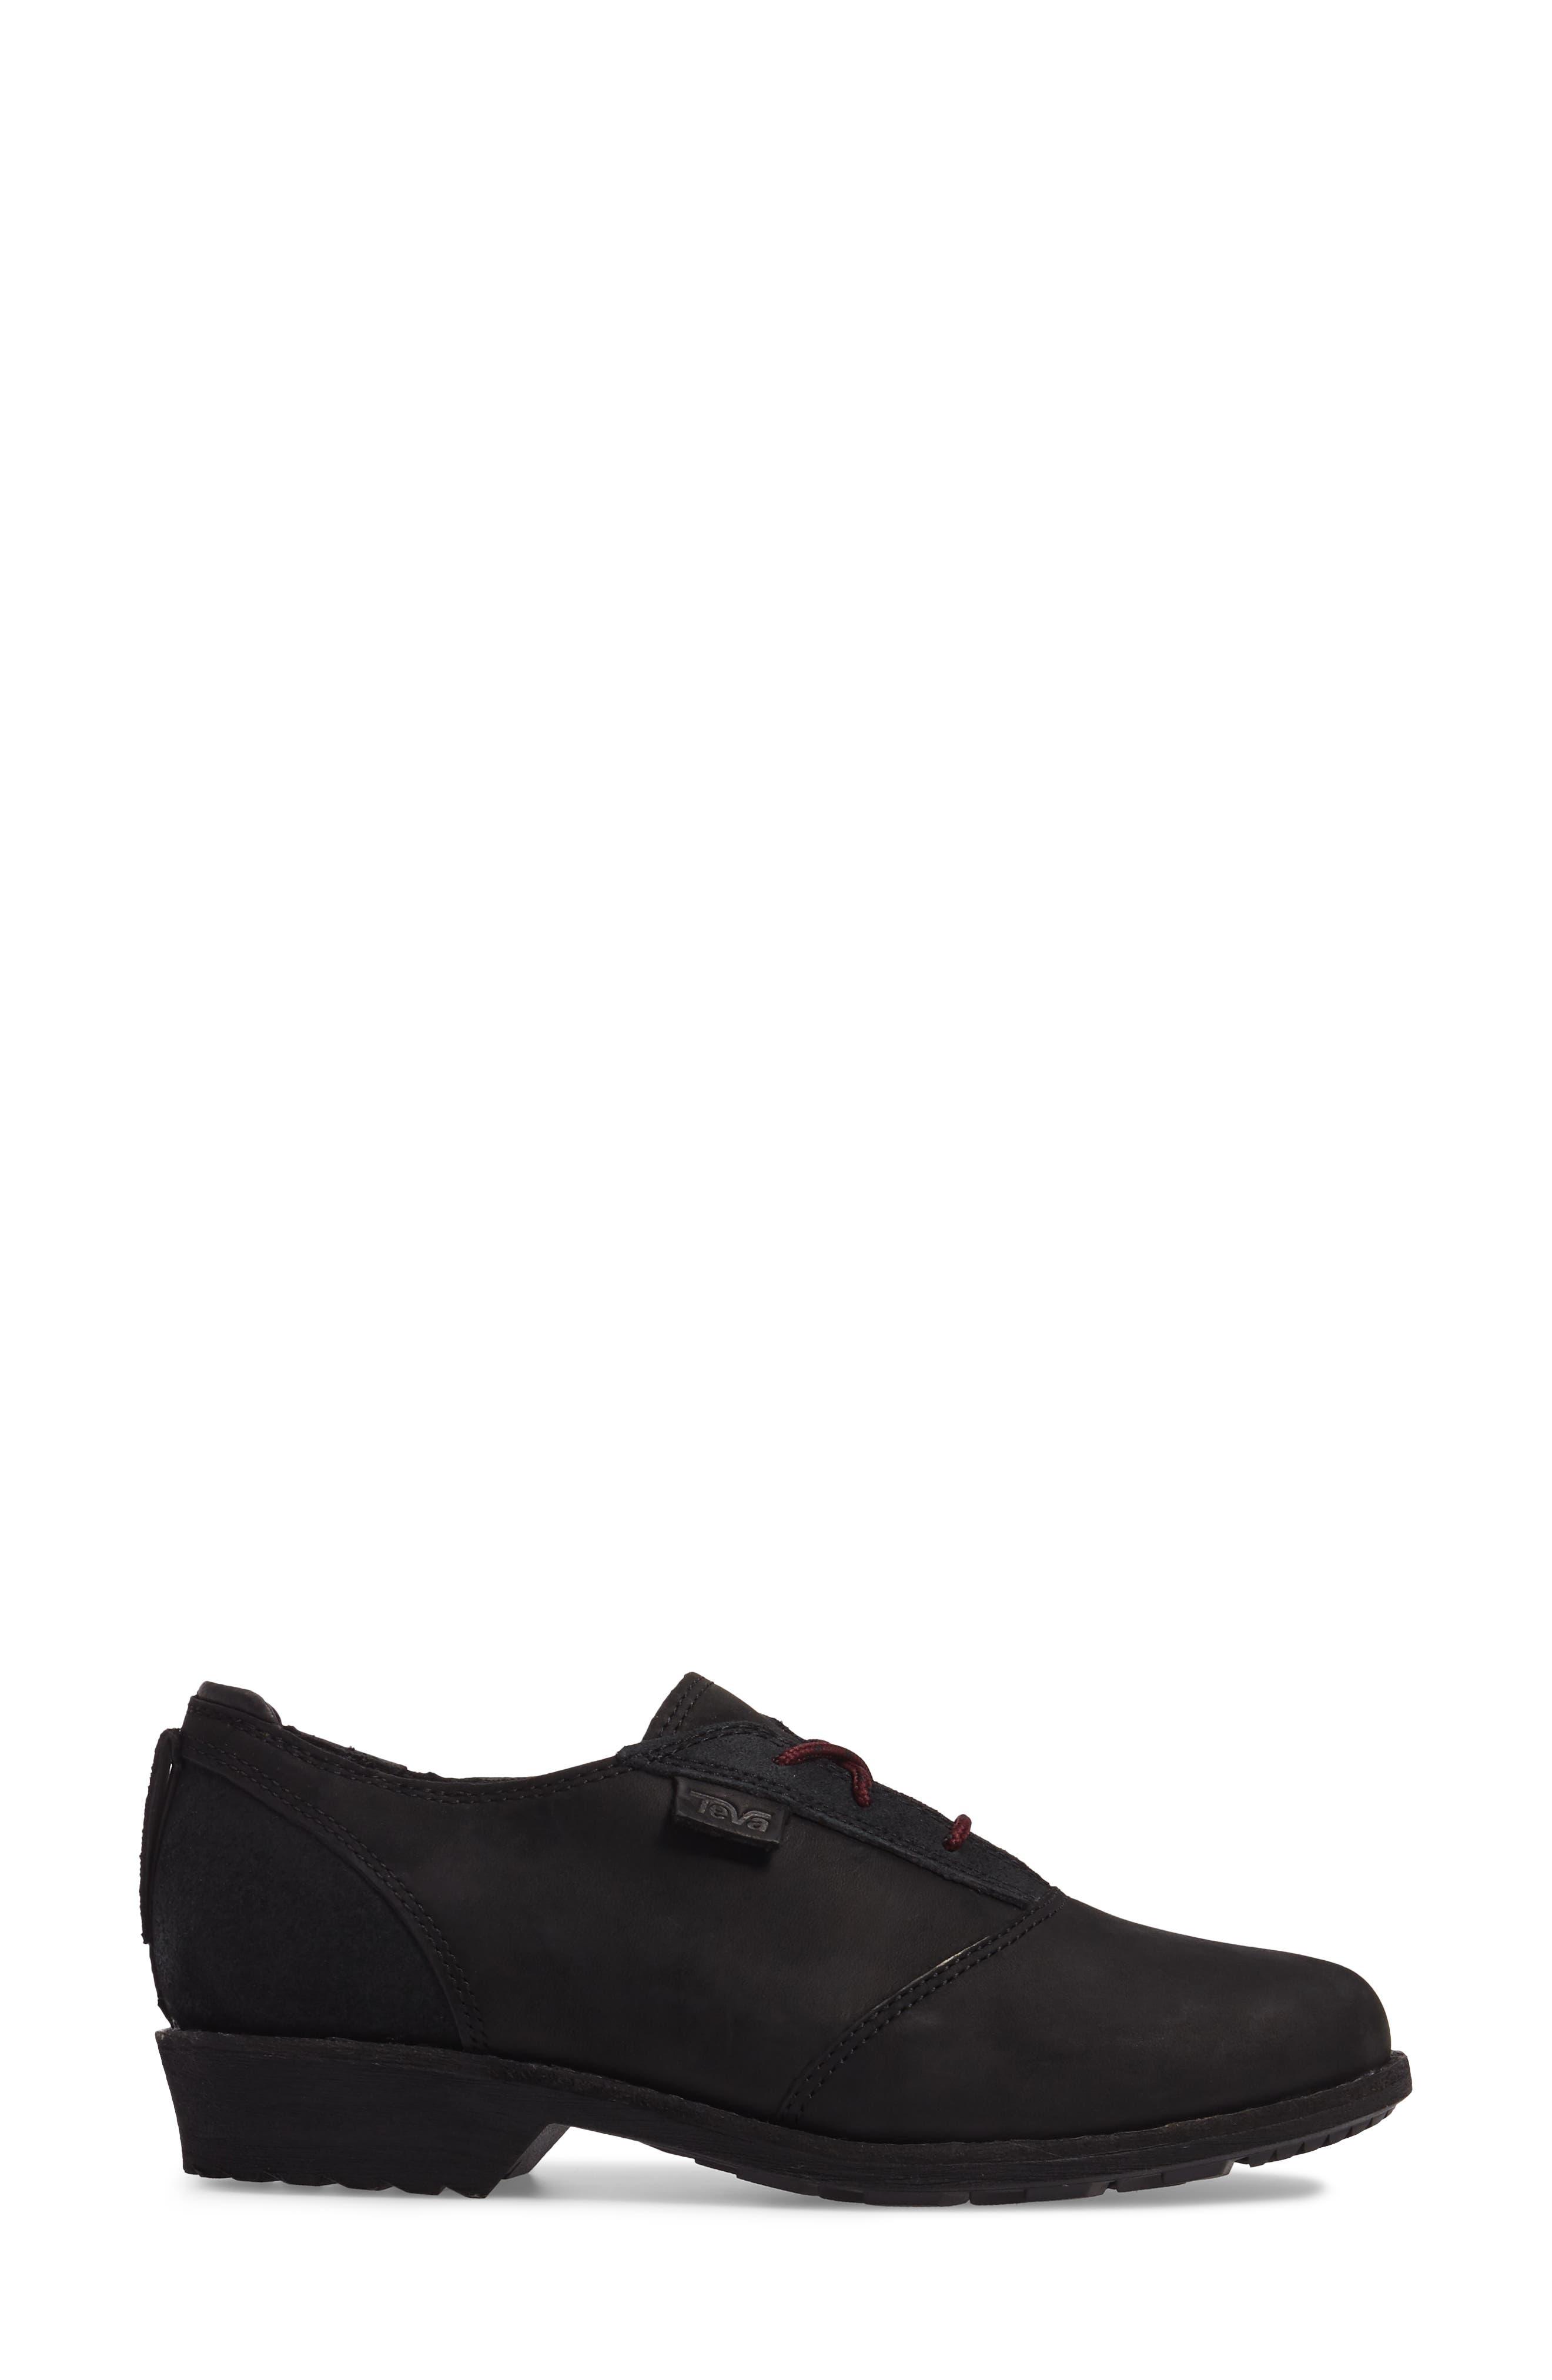 De La Vina Dos Waterproof Sneaker,                             Alternate thumbnail 3, color,                             001